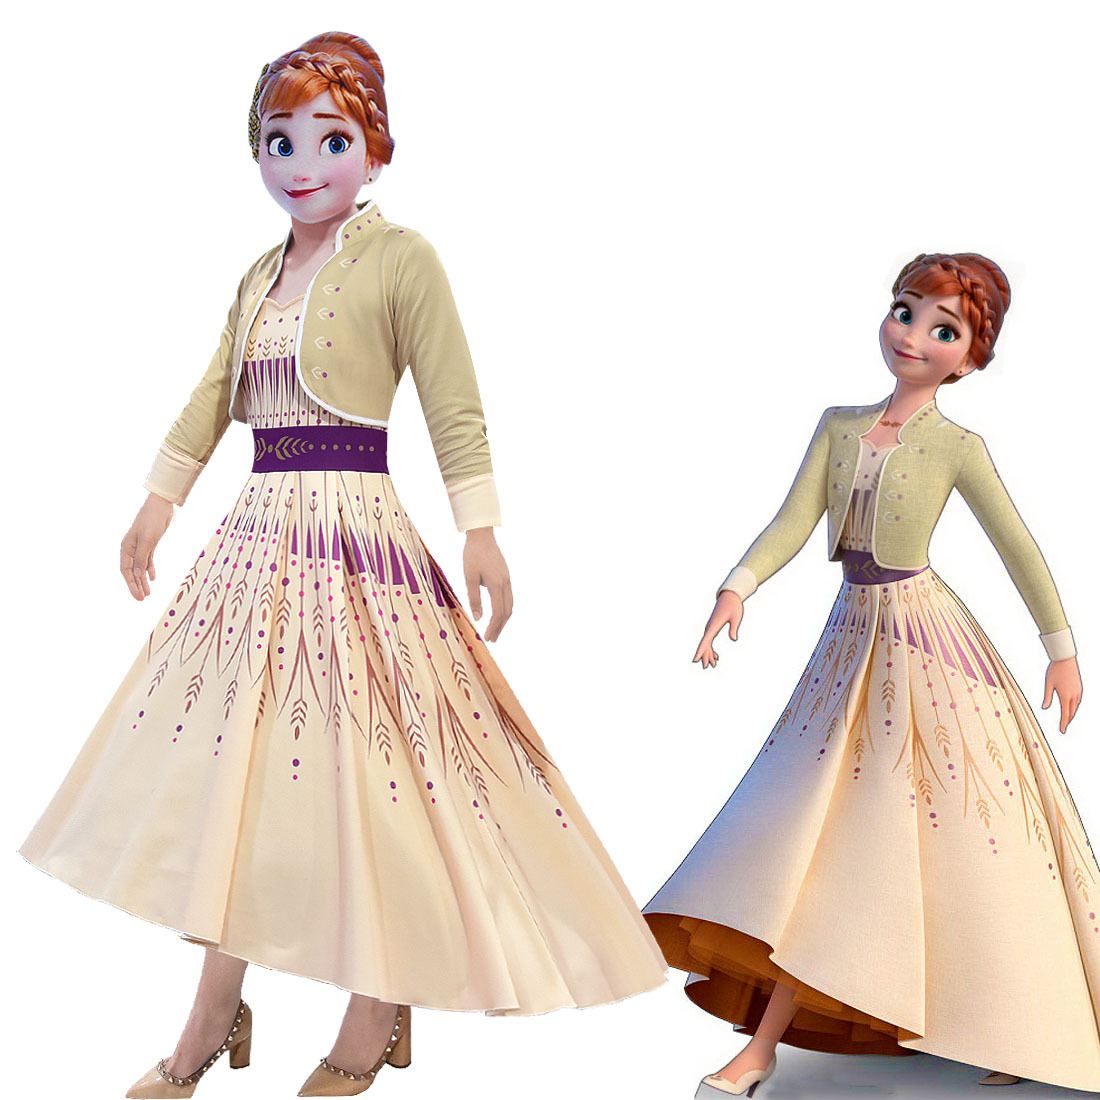 Frozen 2 Anna Elsa 2 Princess Costumes Cosplay For Kids Princess Dresses For Girls Wig/Crown Vestidos Children Girls Elsa Dress